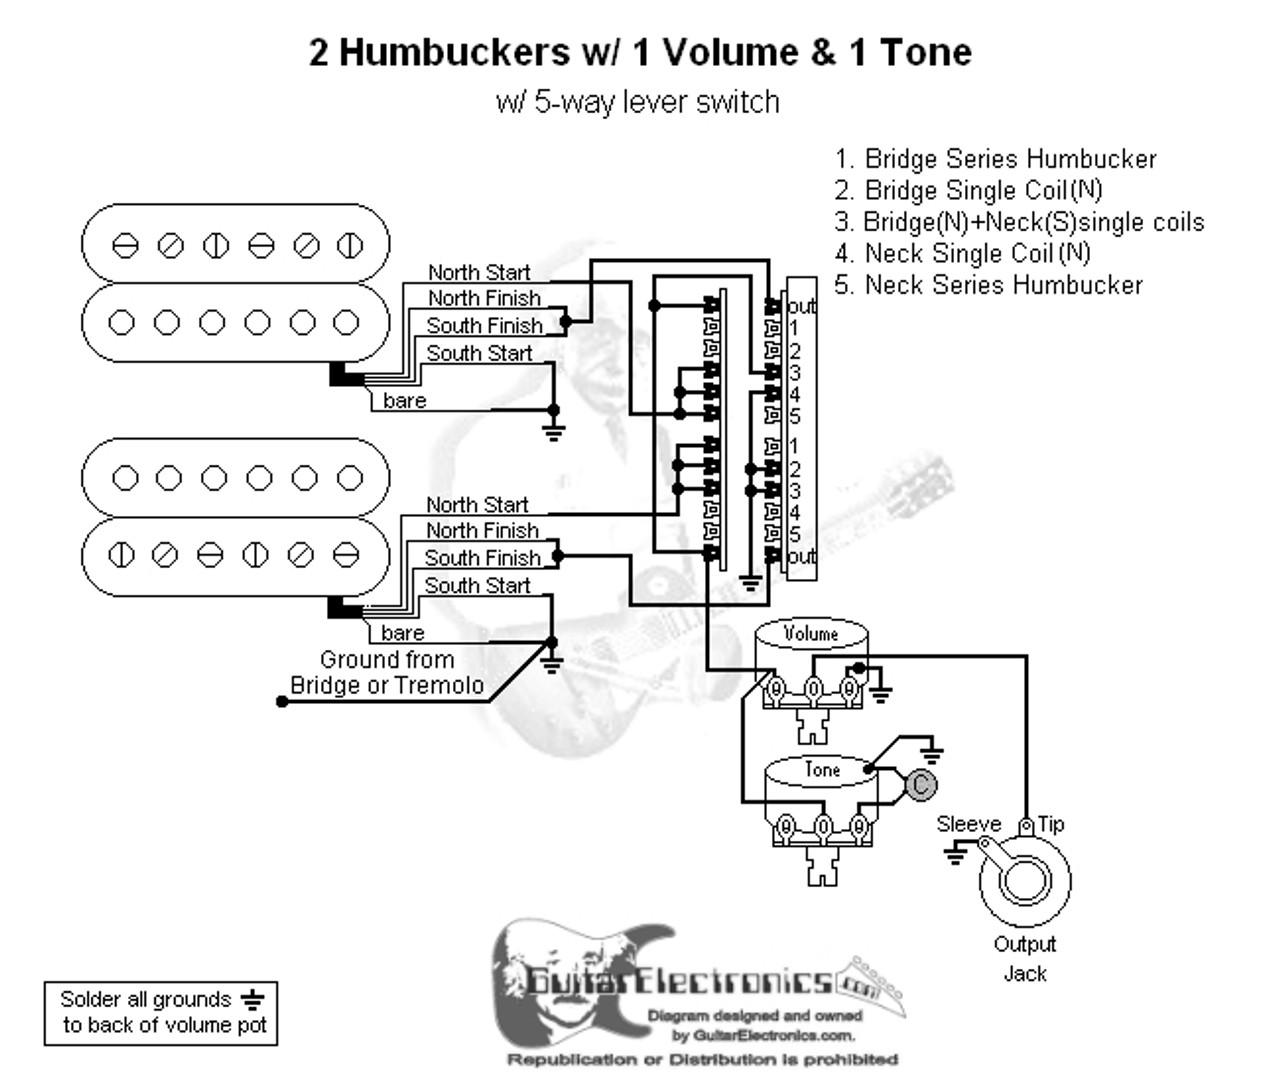 2 humbuckers 1 vol 1 tone 5 way super switch wiring diagram schema2 humbuckers 5 way lever switch 1 volume 1 tone 01 2 humbuckers 1 vol 1 tone 5 way super  [ 1280 x 1083 Pixel ]